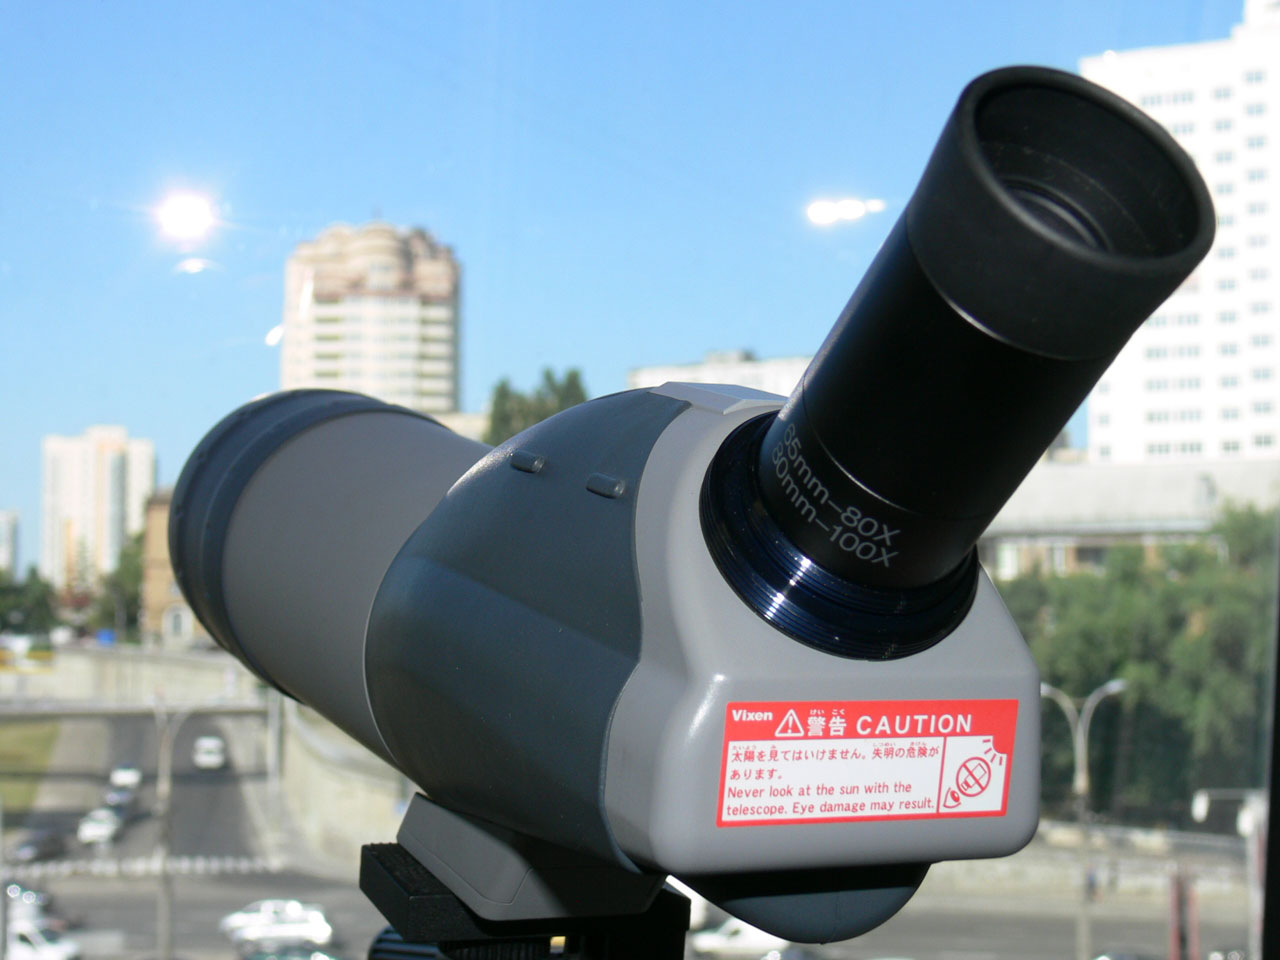 Установленный на зрительную трубу Vixen Geoma 65A окуляр 80х